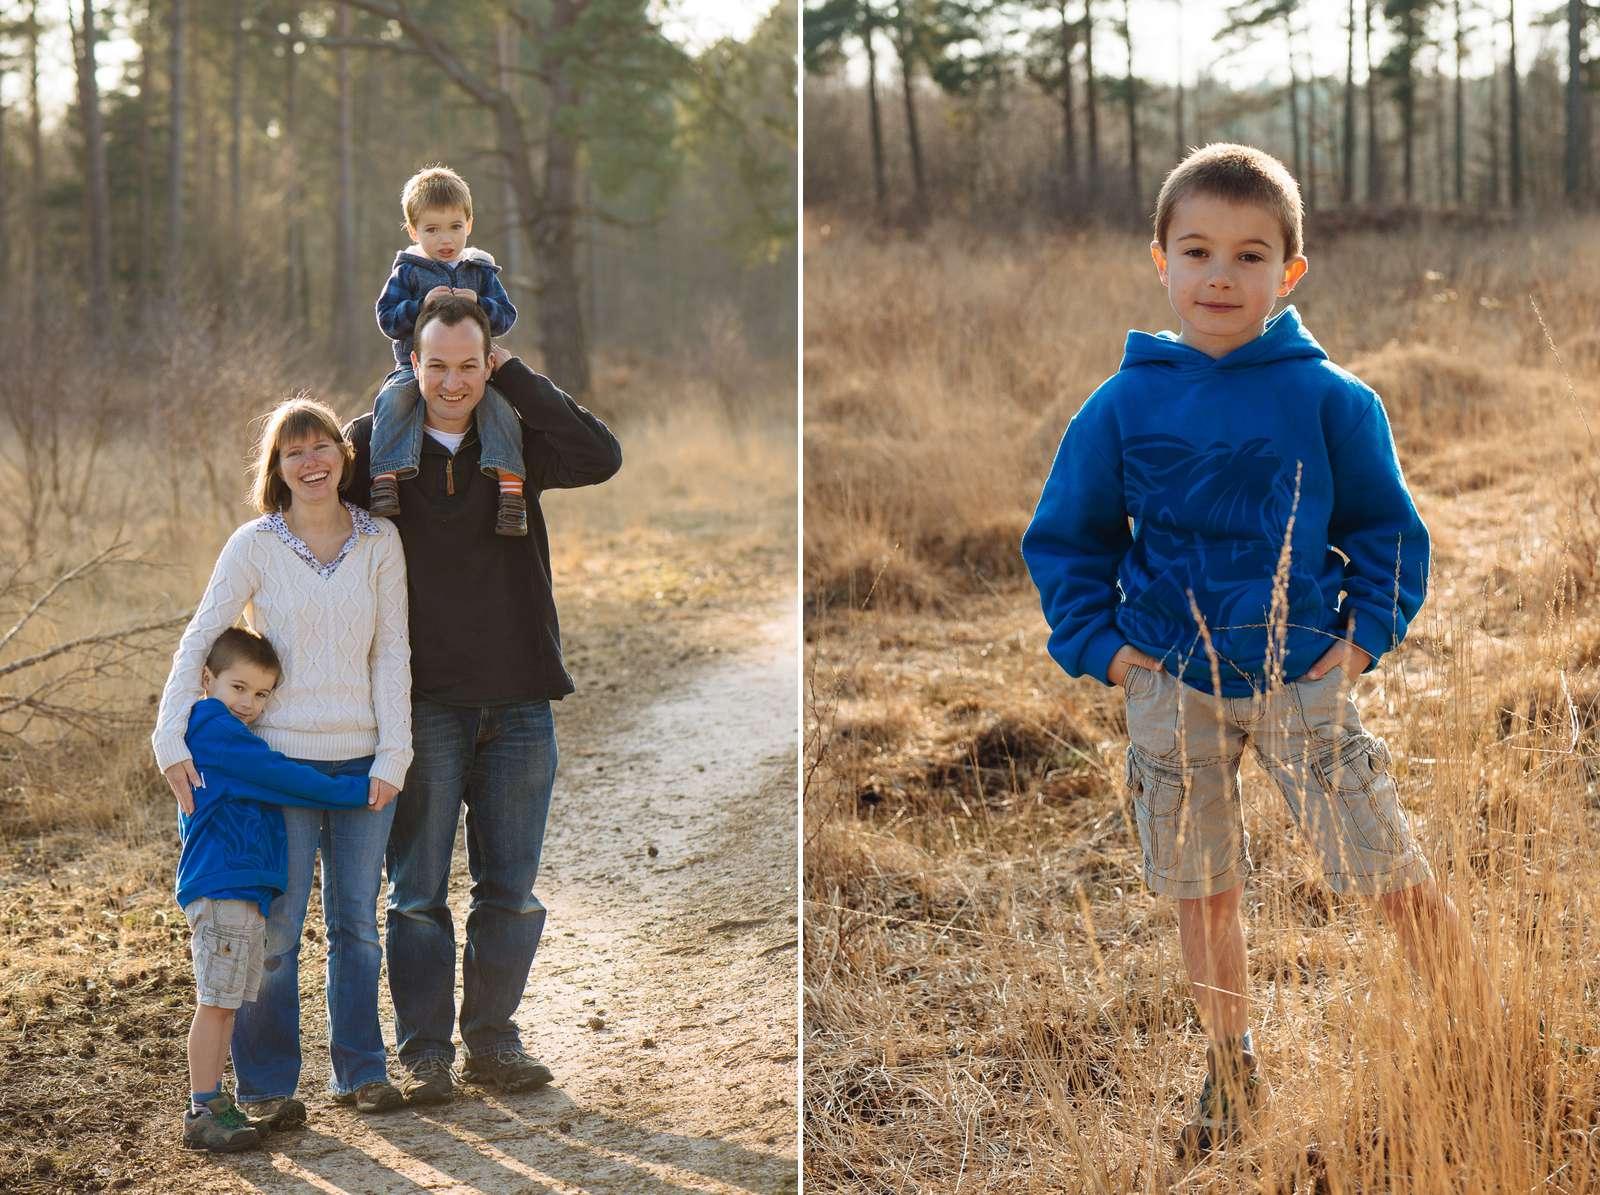 Pulborough-family-photographer-010